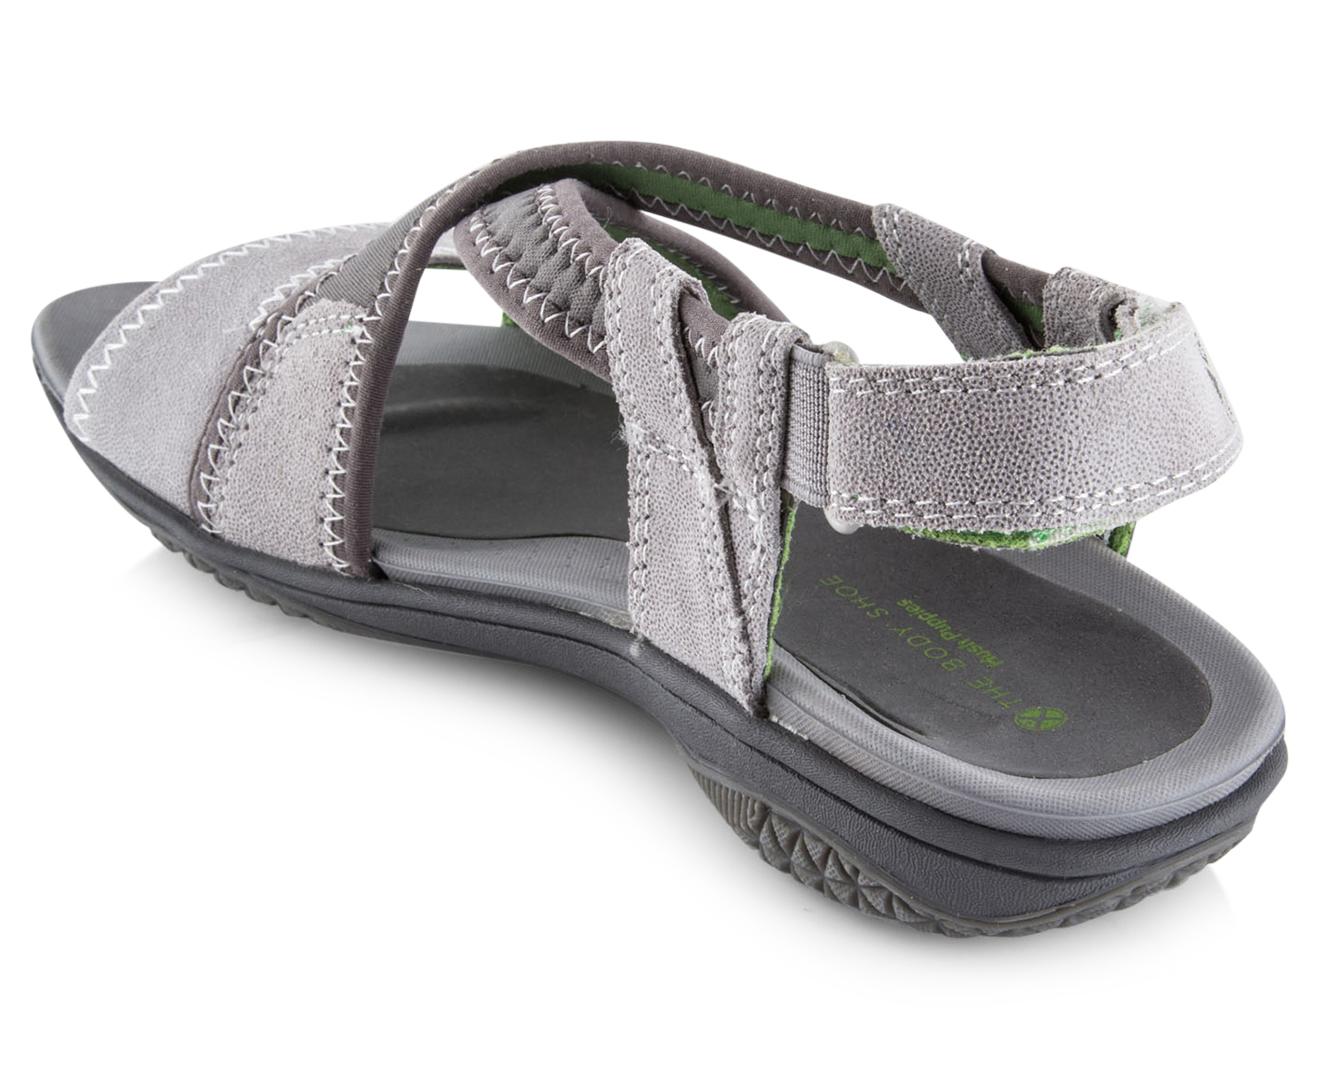 Hush Puppies Women S Bobbi Ione Sandals Grey Multi